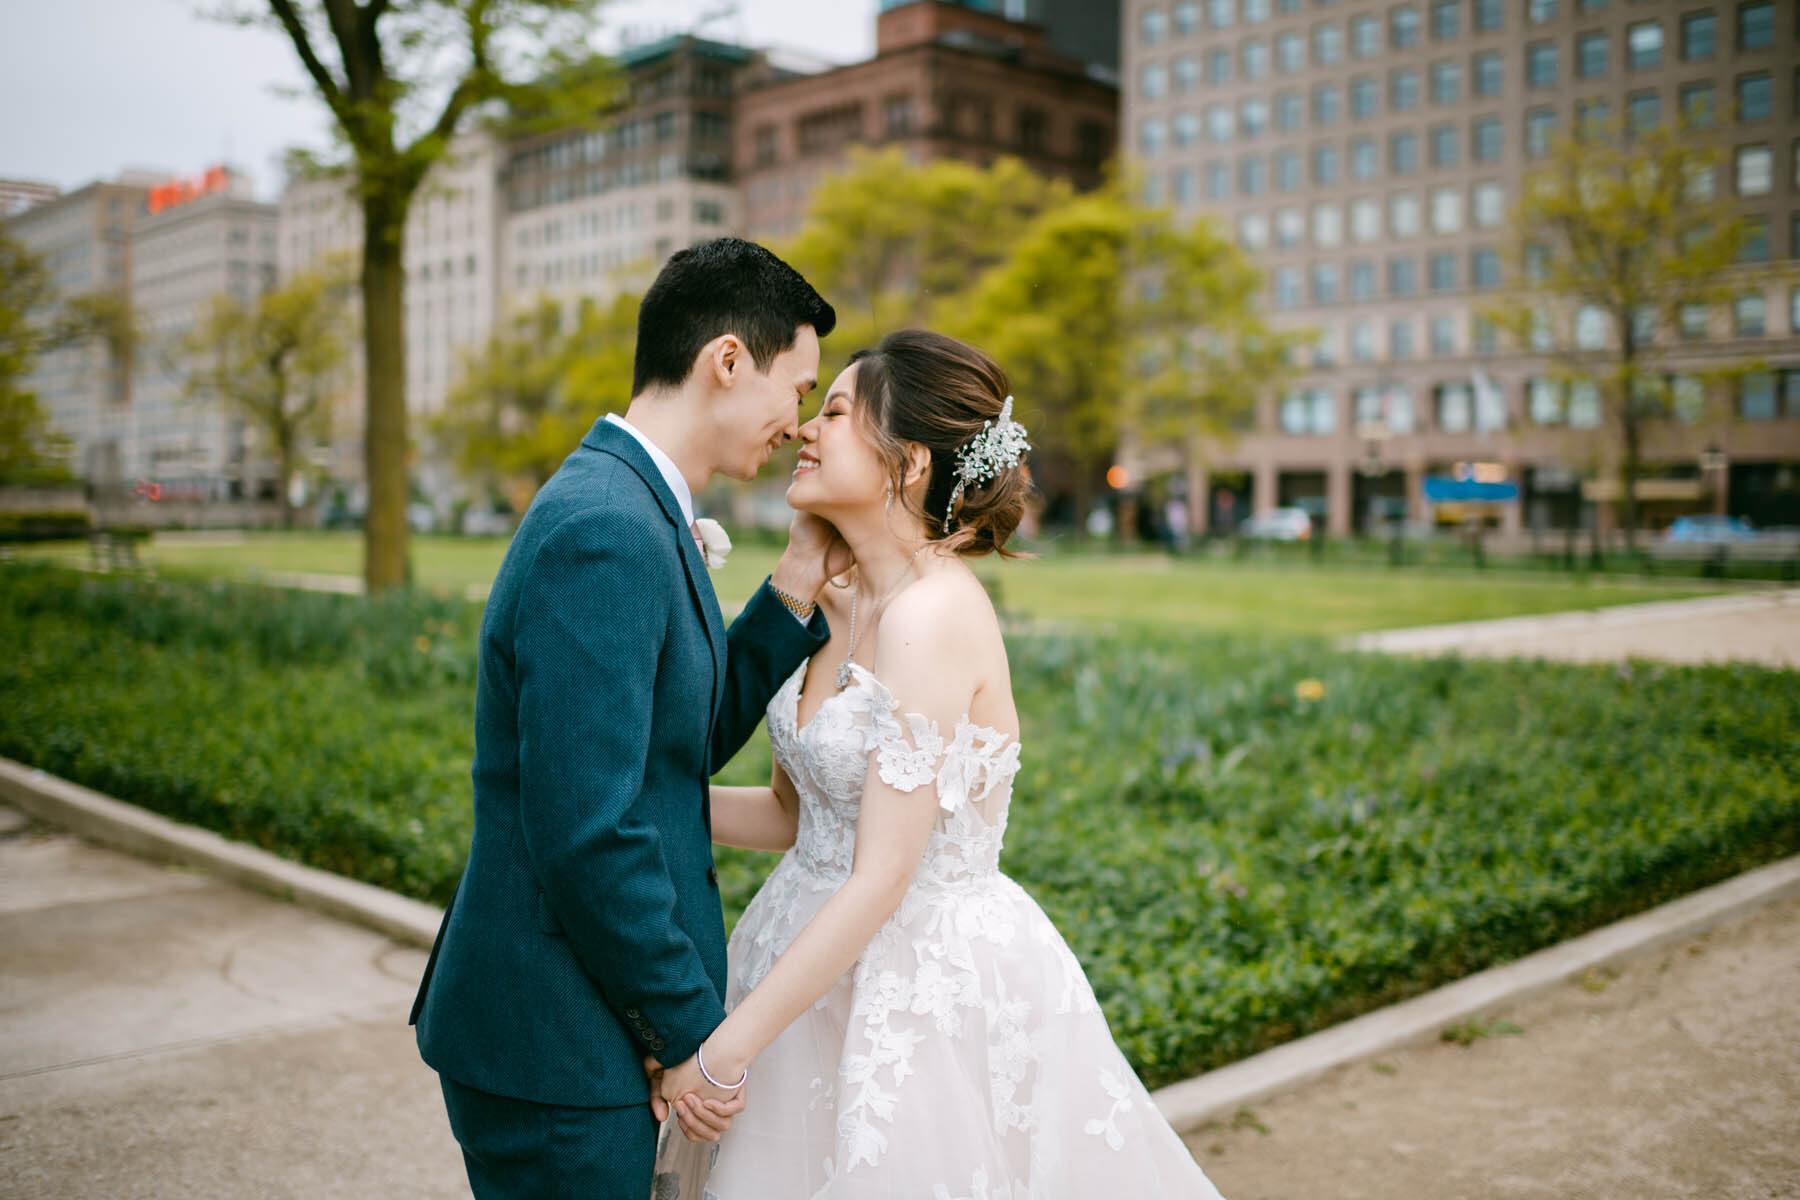 Grant Park wedding